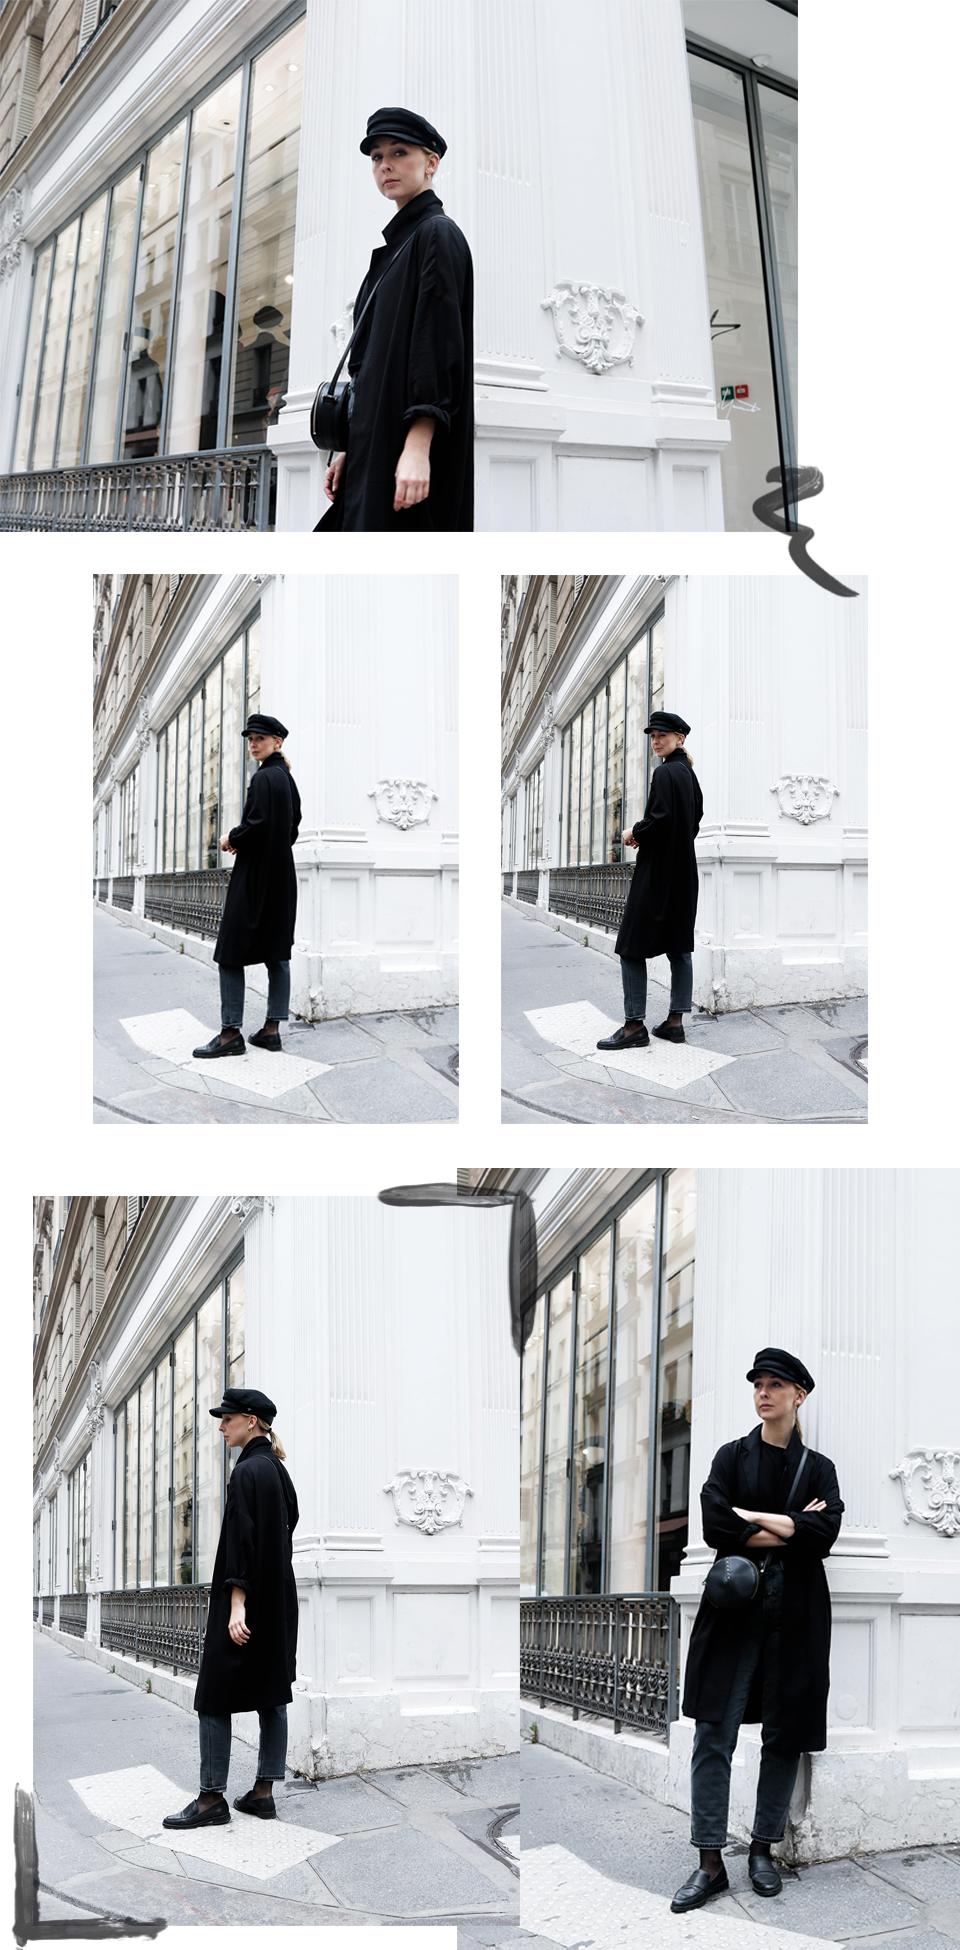 noa-noir-fashion-outfit-all-black-paris-fashion-week-pfw-minimal-streetsyle-1-2.png